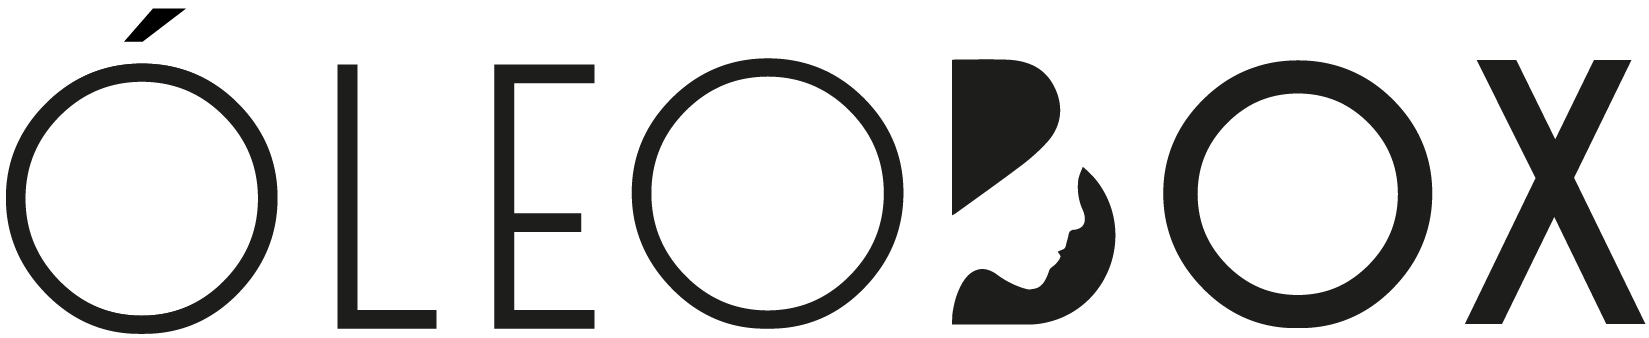 Óleobox